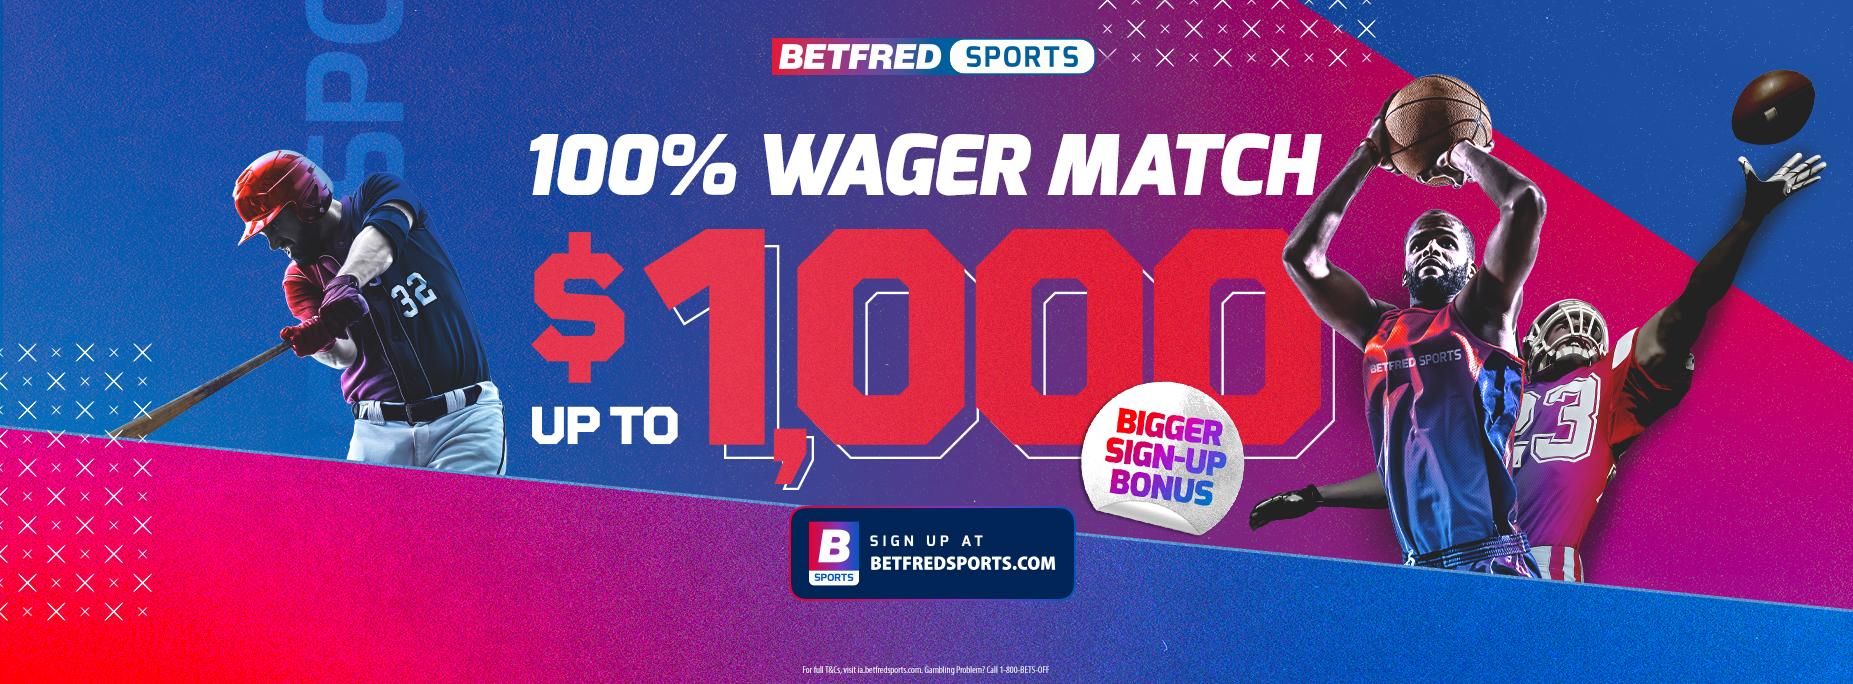 scottish sports futures betting